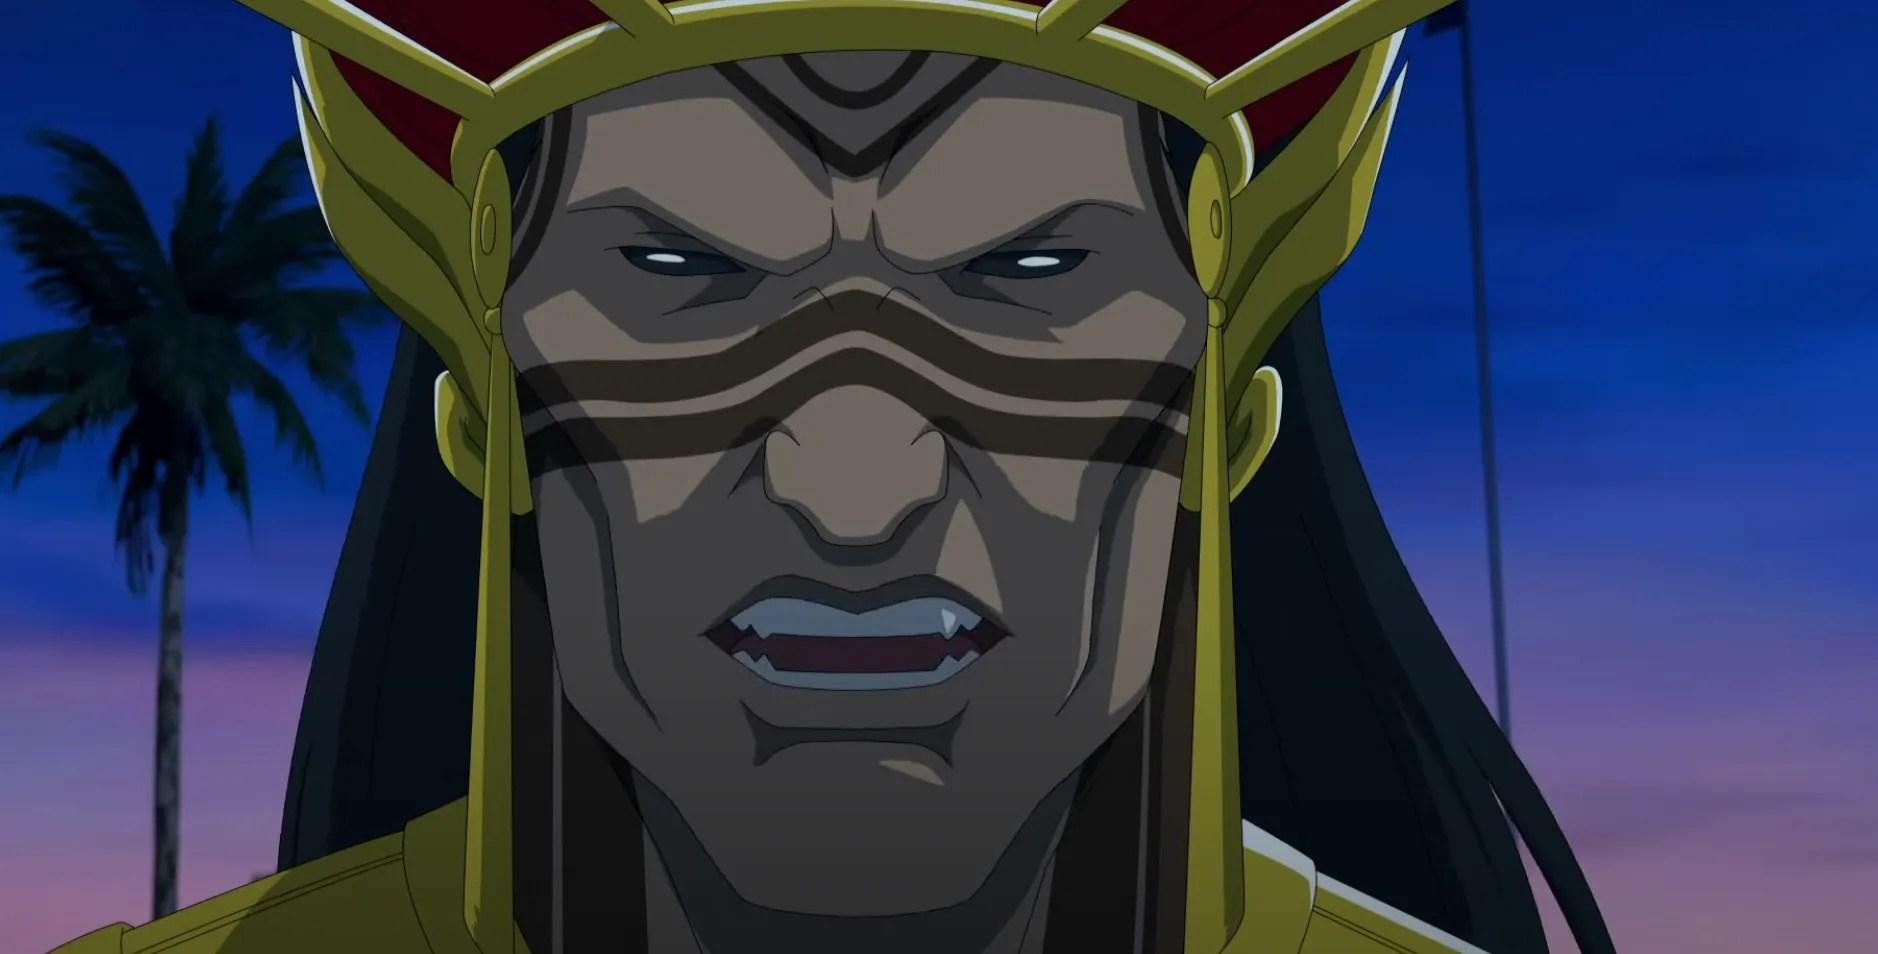 Trese's Main Villain Reveal Is a Naruto Ripoff | CBR